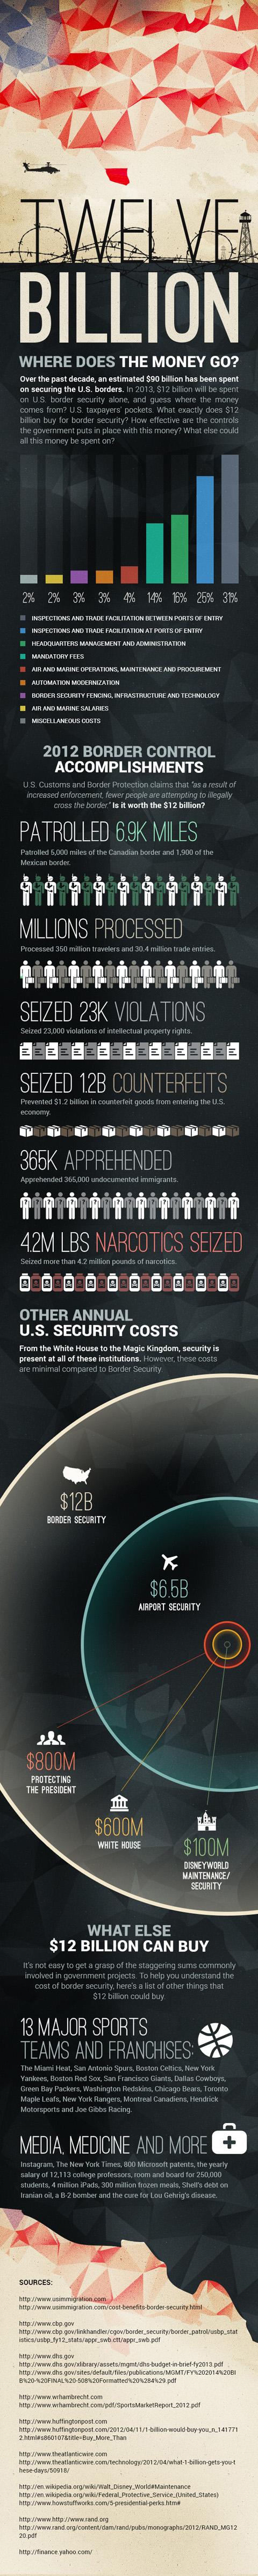 Lavish Spending on U.S. Security